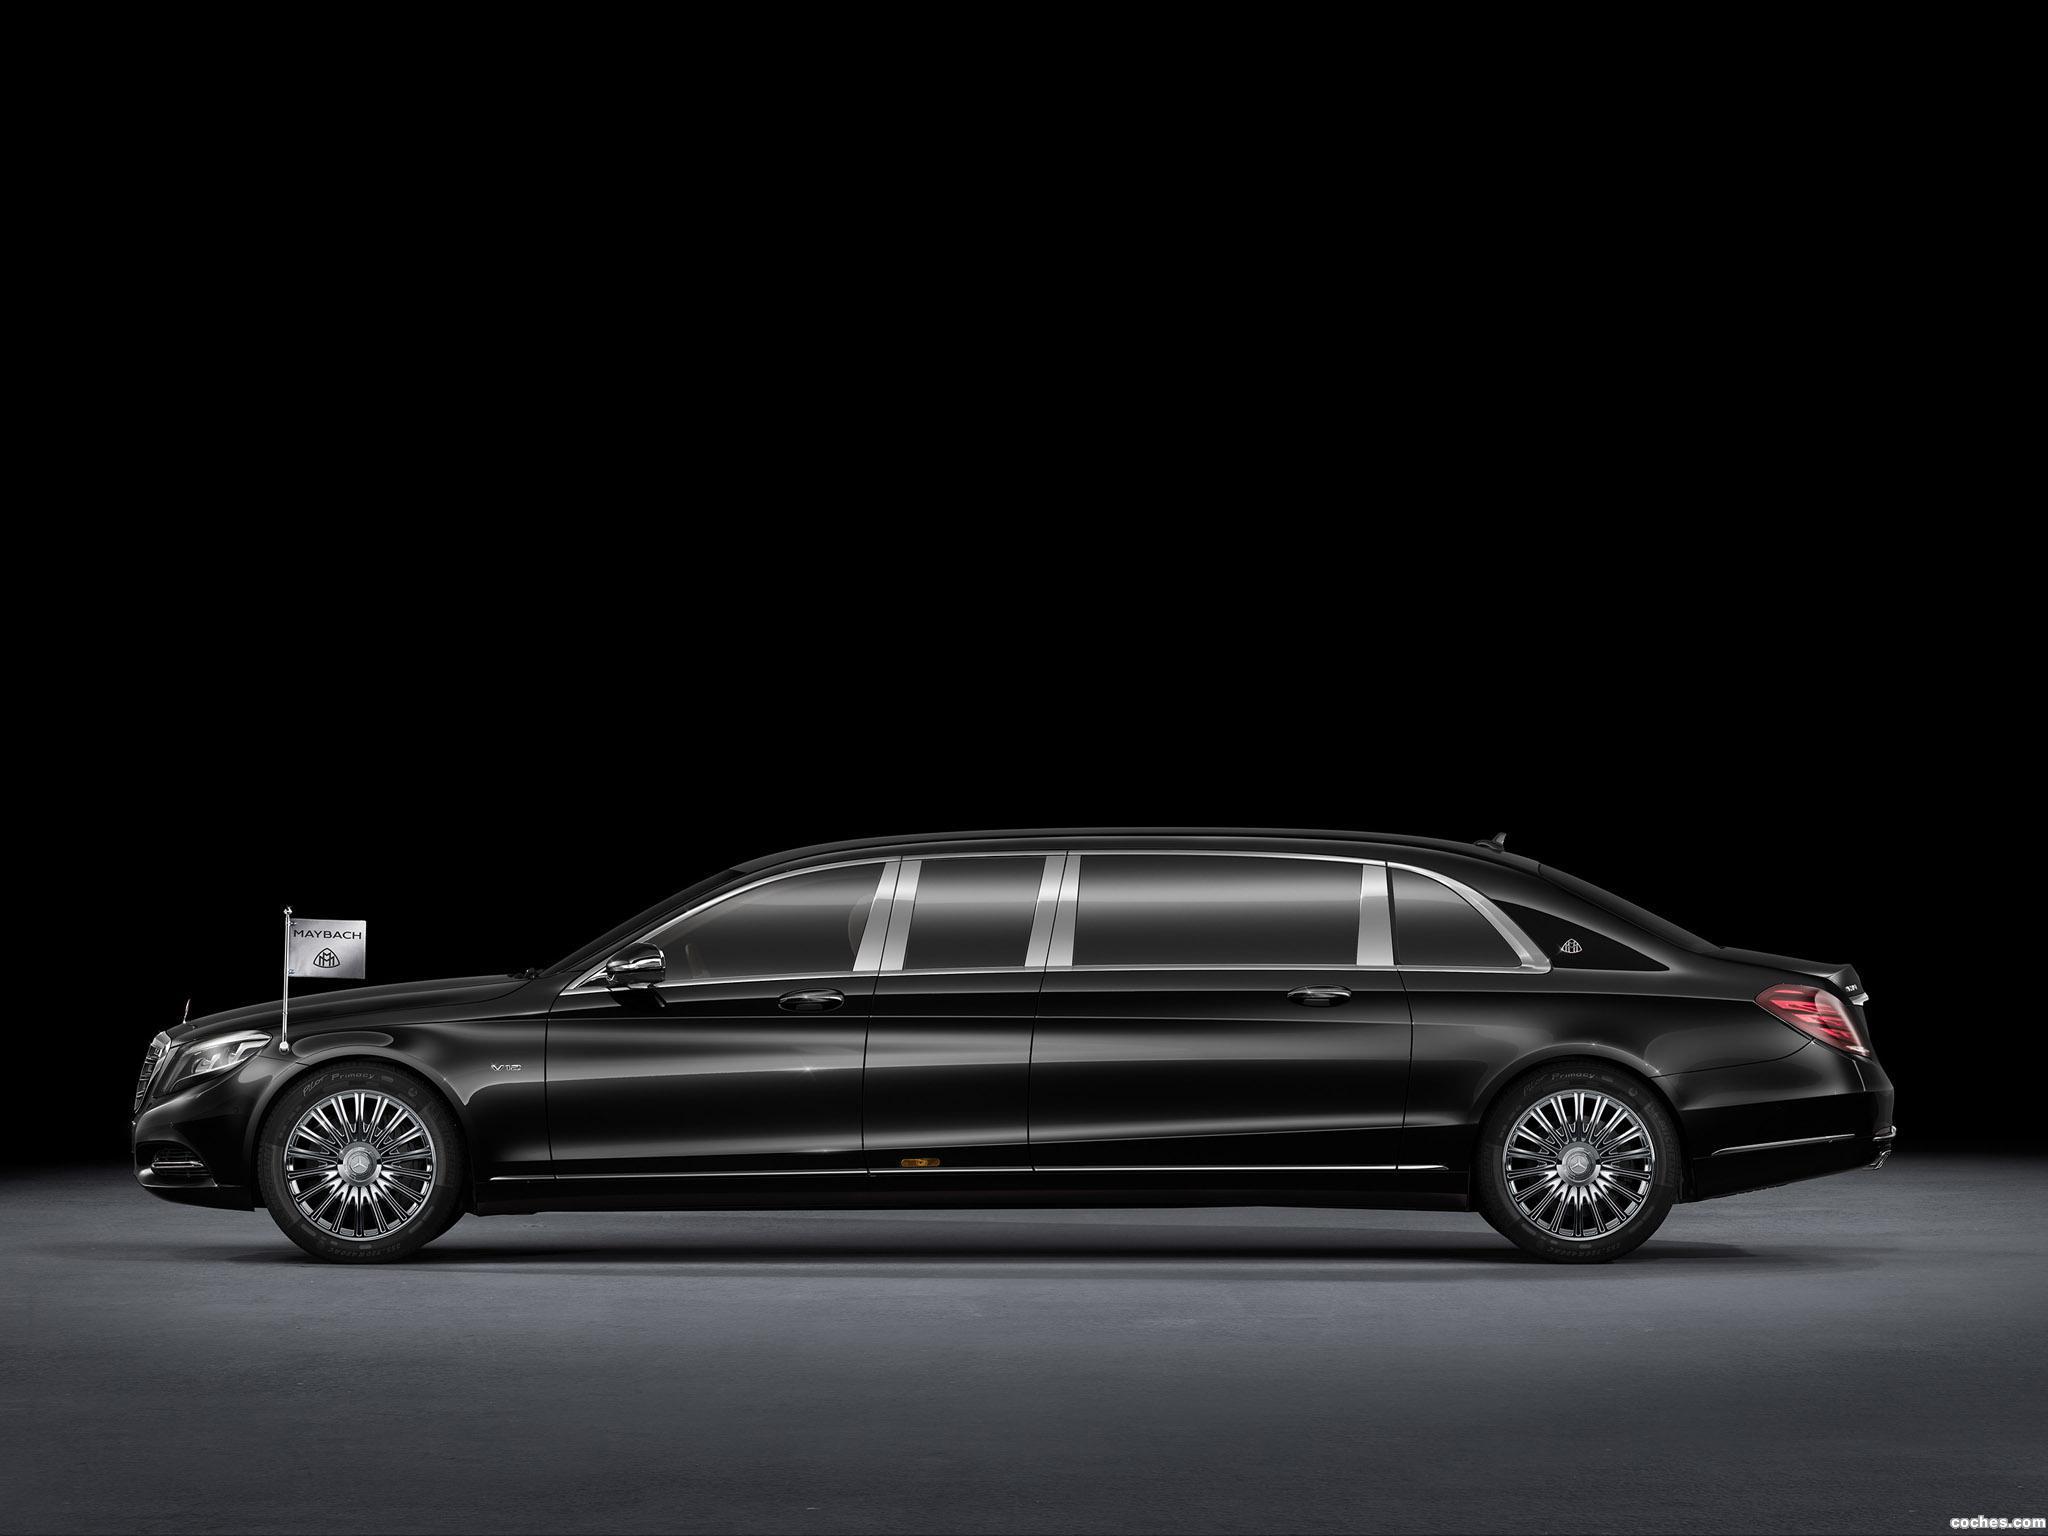 Foto 3 de Mercedes Maybach Clase S S600 Pullman 2015